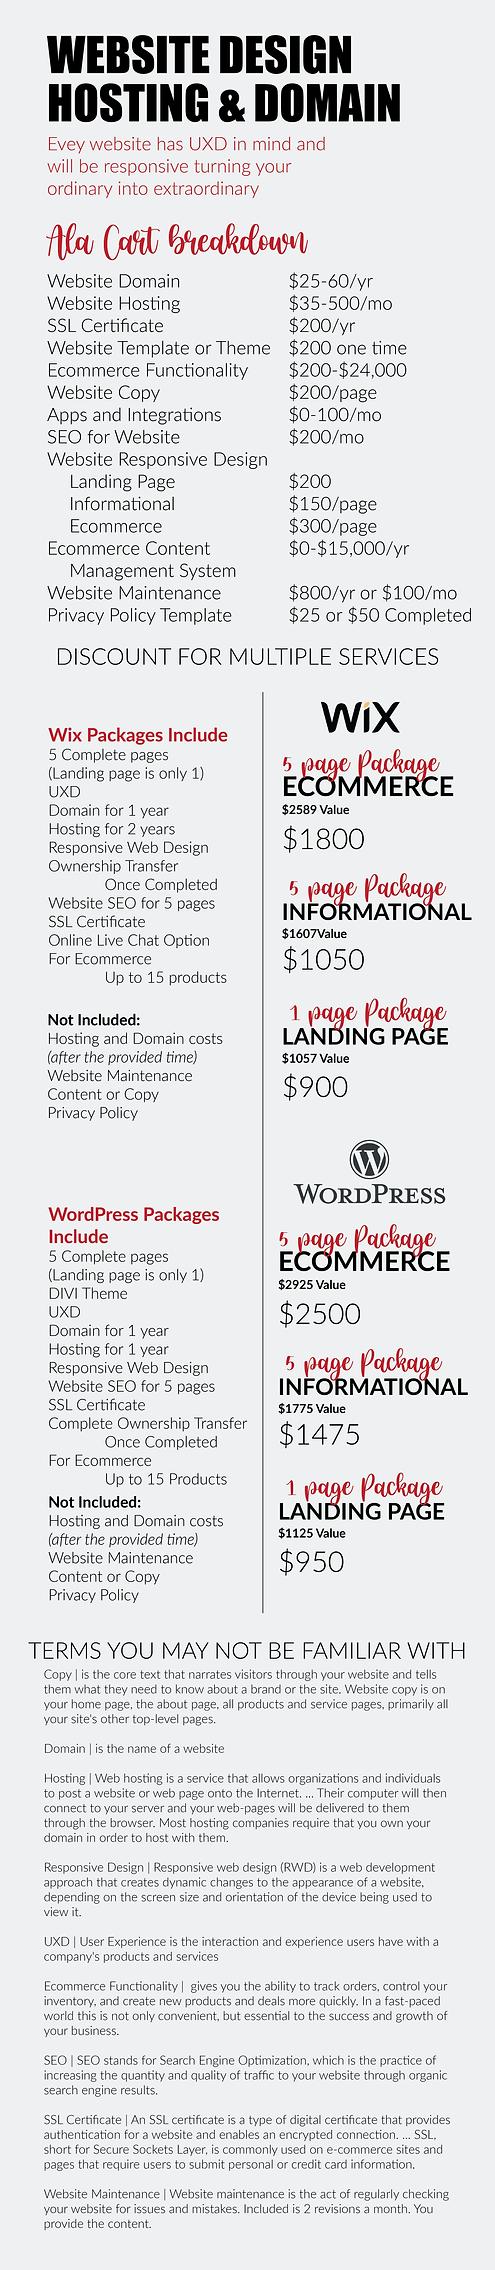 Website Price List.png